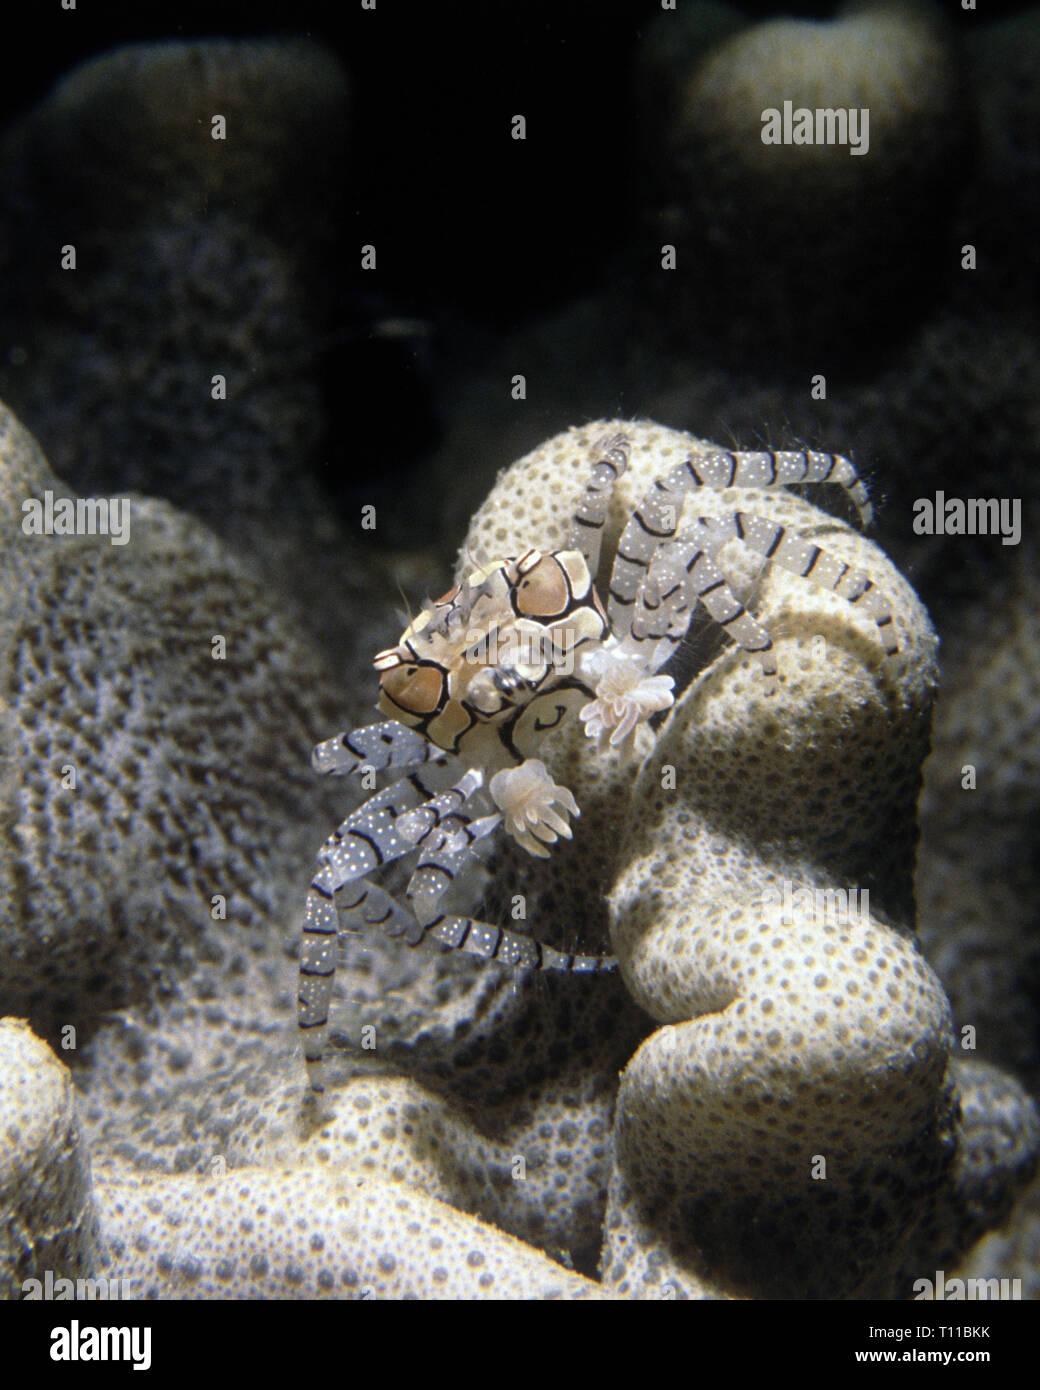 Boxing crab (Lybia tessellata) - Stock Image